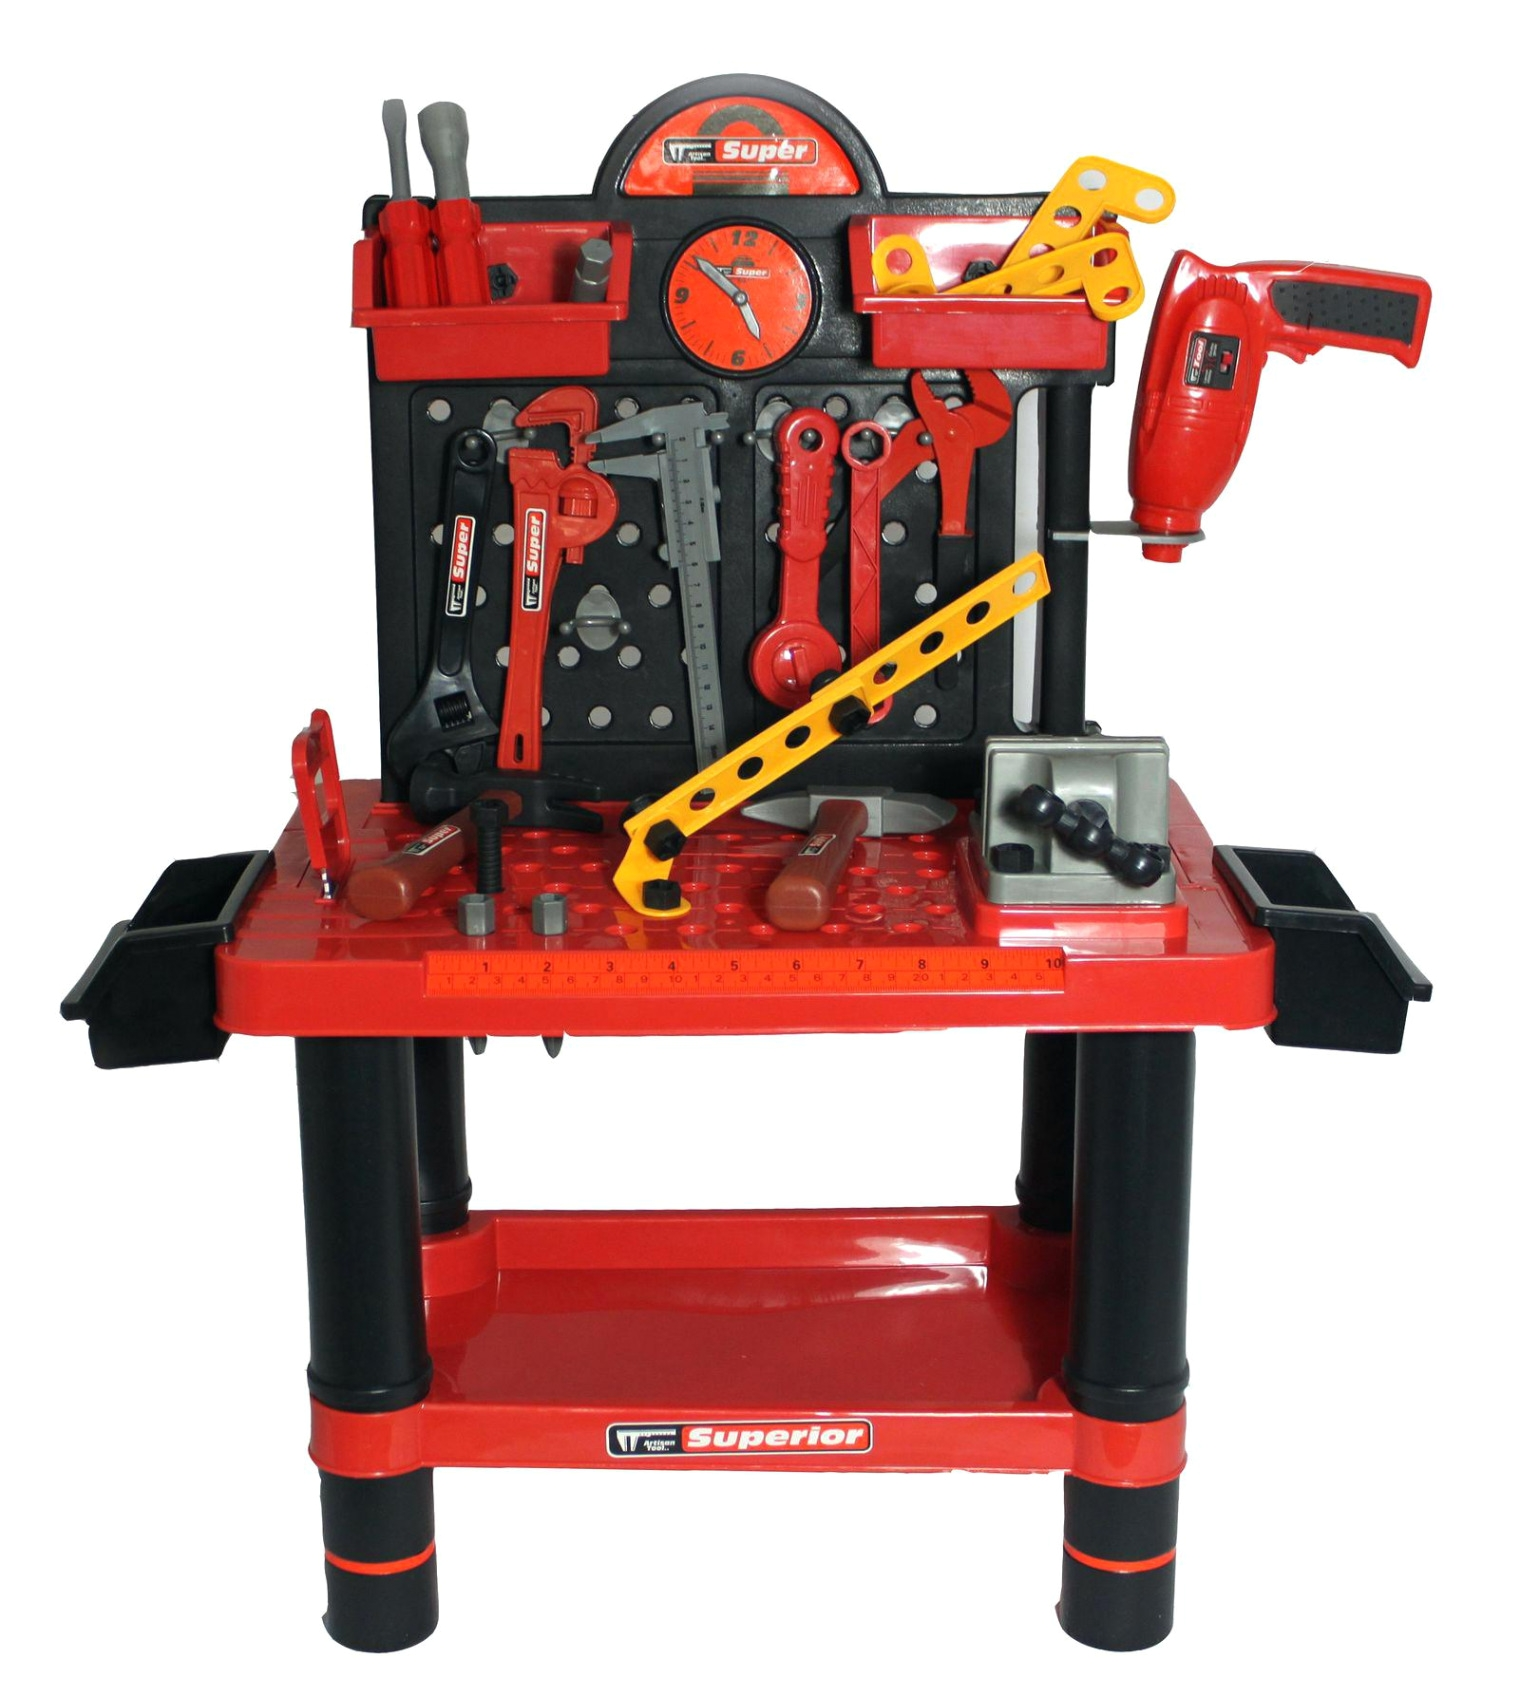 Groovy Home Depot Toy Tool Bench Bradshomefurnishings Ibusinesslaw Wood Chair Design Ideas Ibusinesslaworg